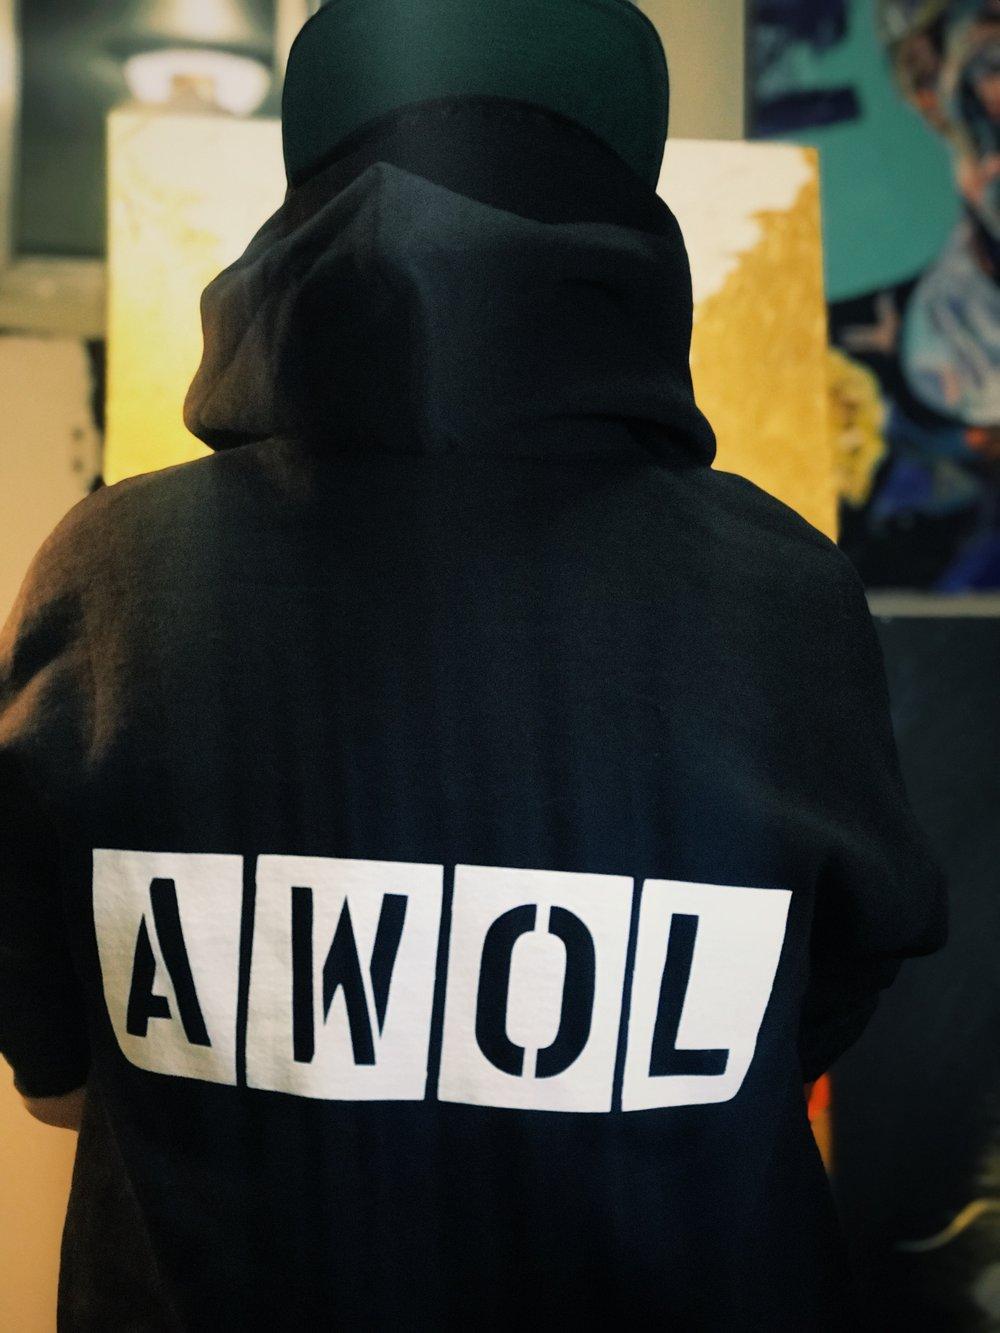 AWOL Stencils Hoodies